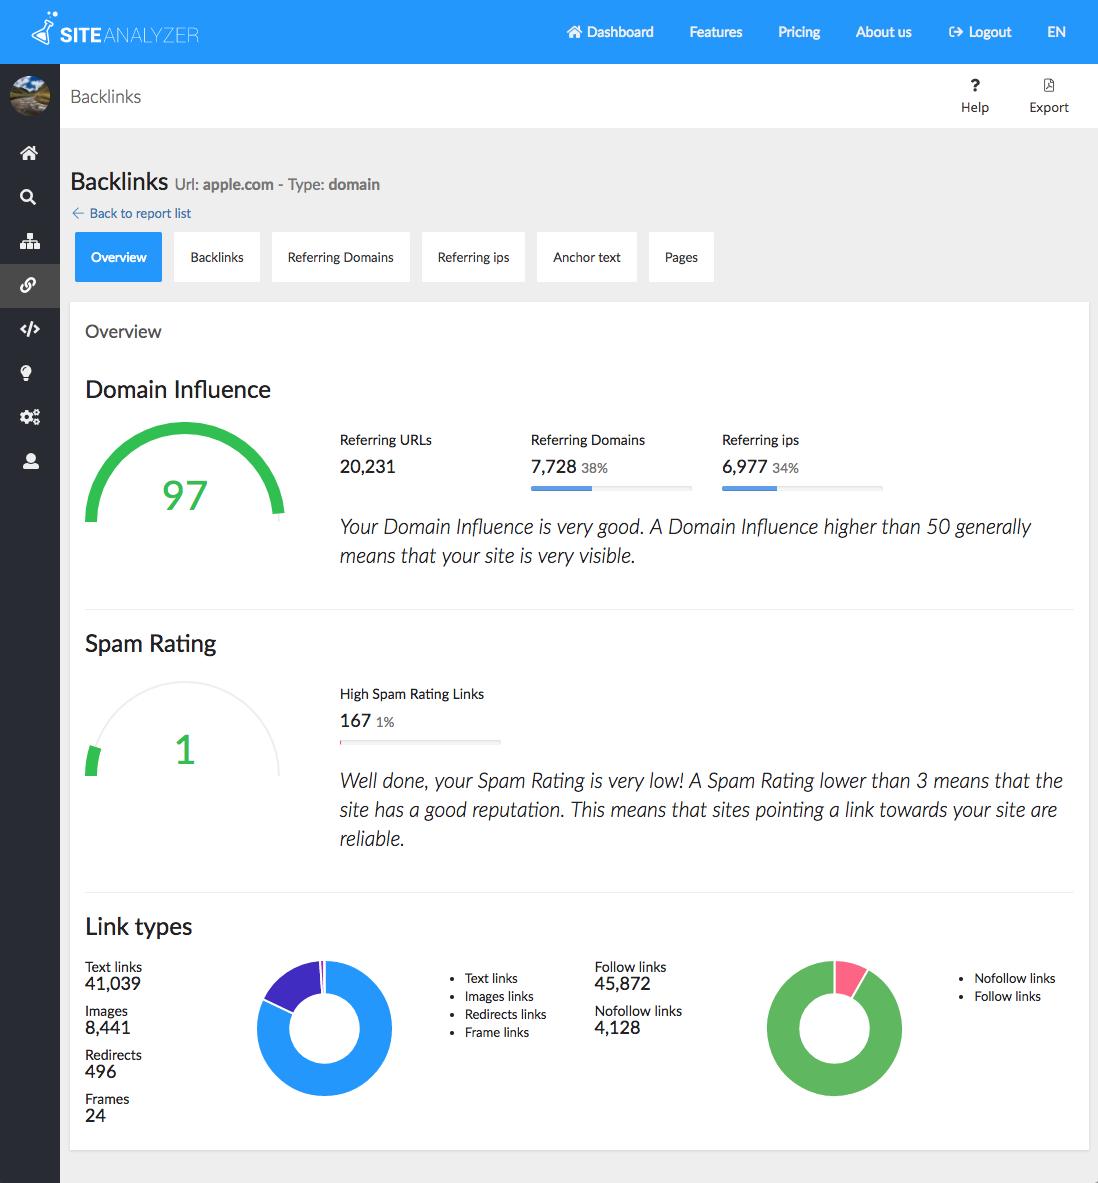 Site Analyzer Demo - Backlinks Report Overview